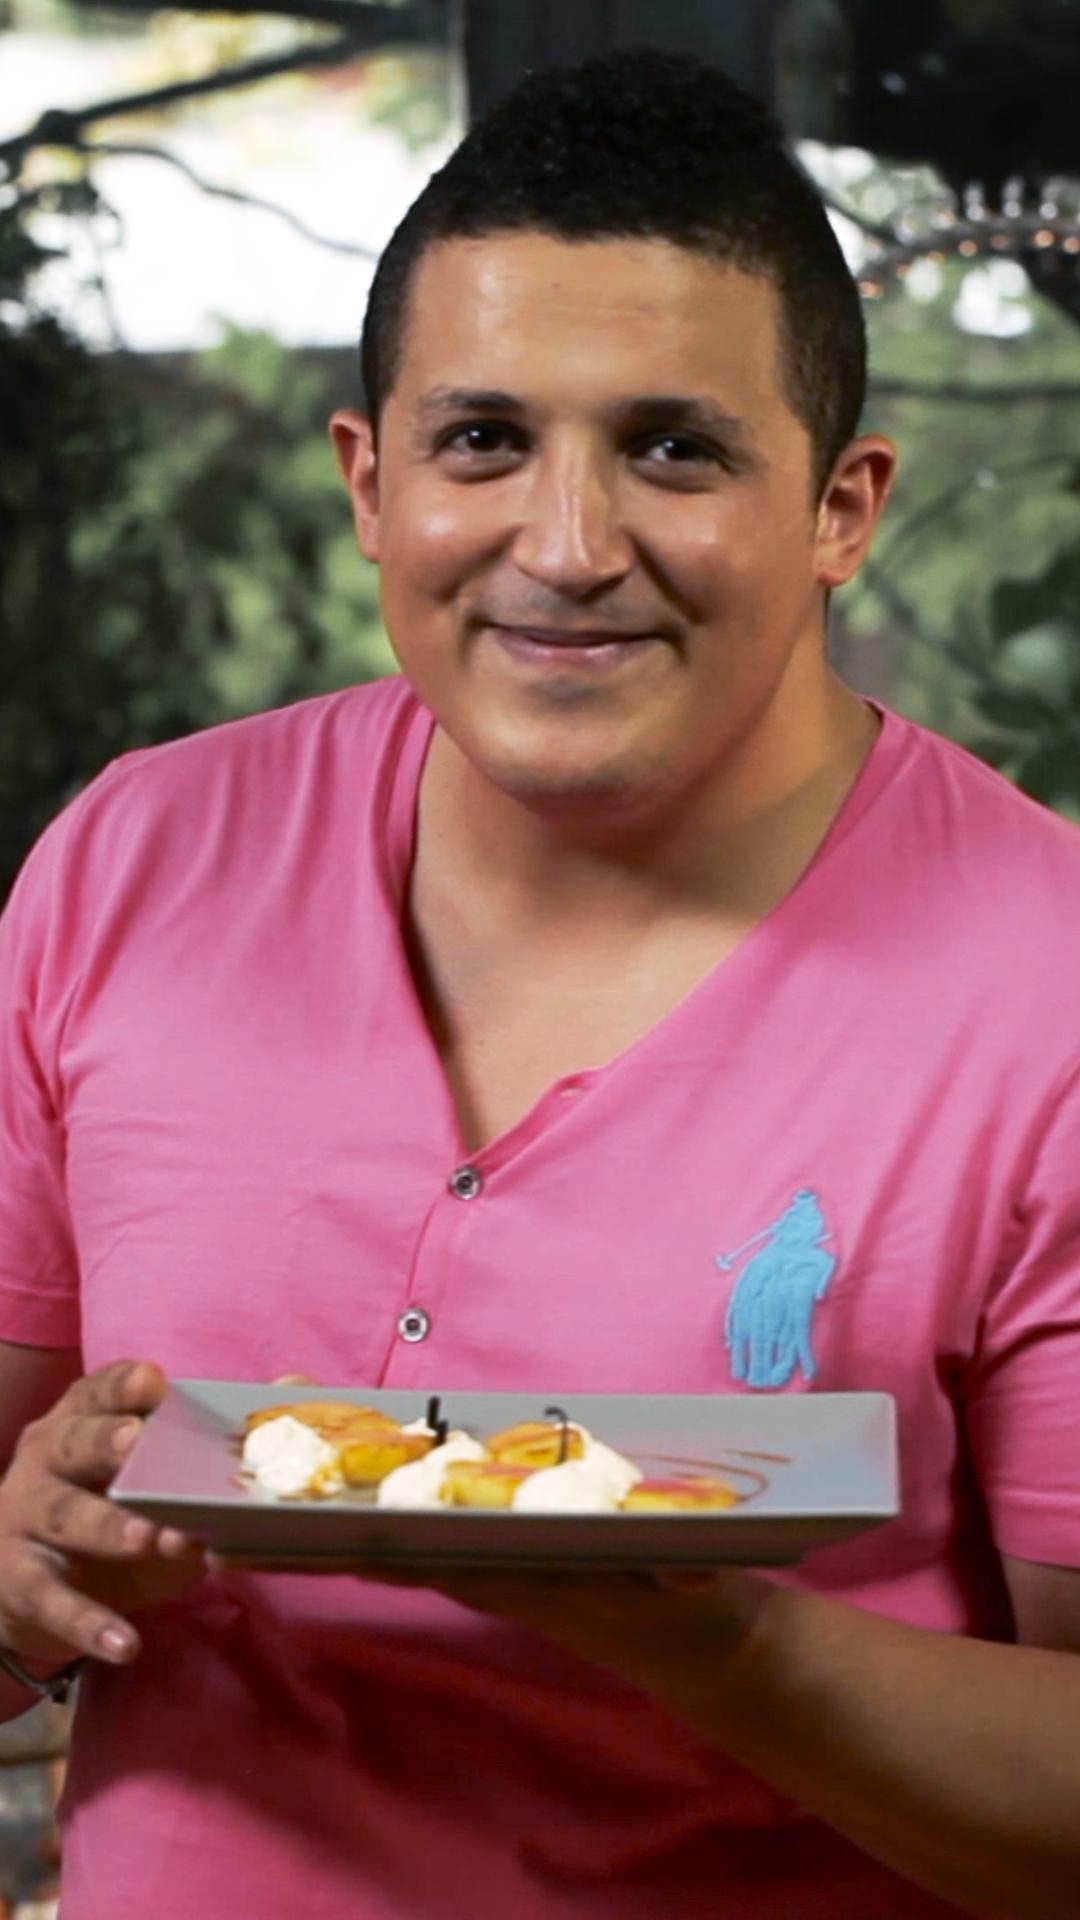 Ananas flambé #chefclubrecettevideos